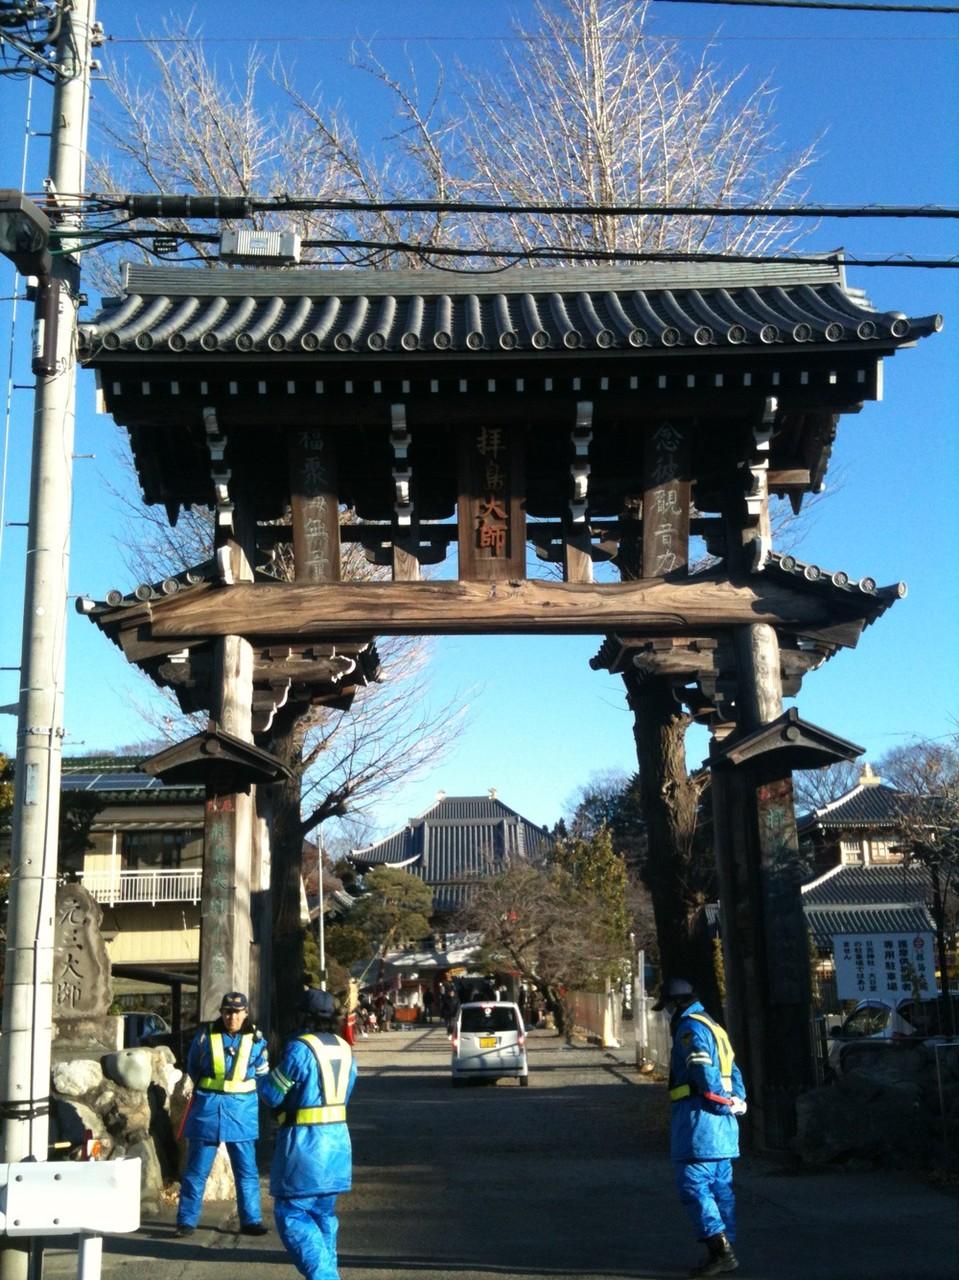 Entrance of Akishima Daishi Tokyo Akishima